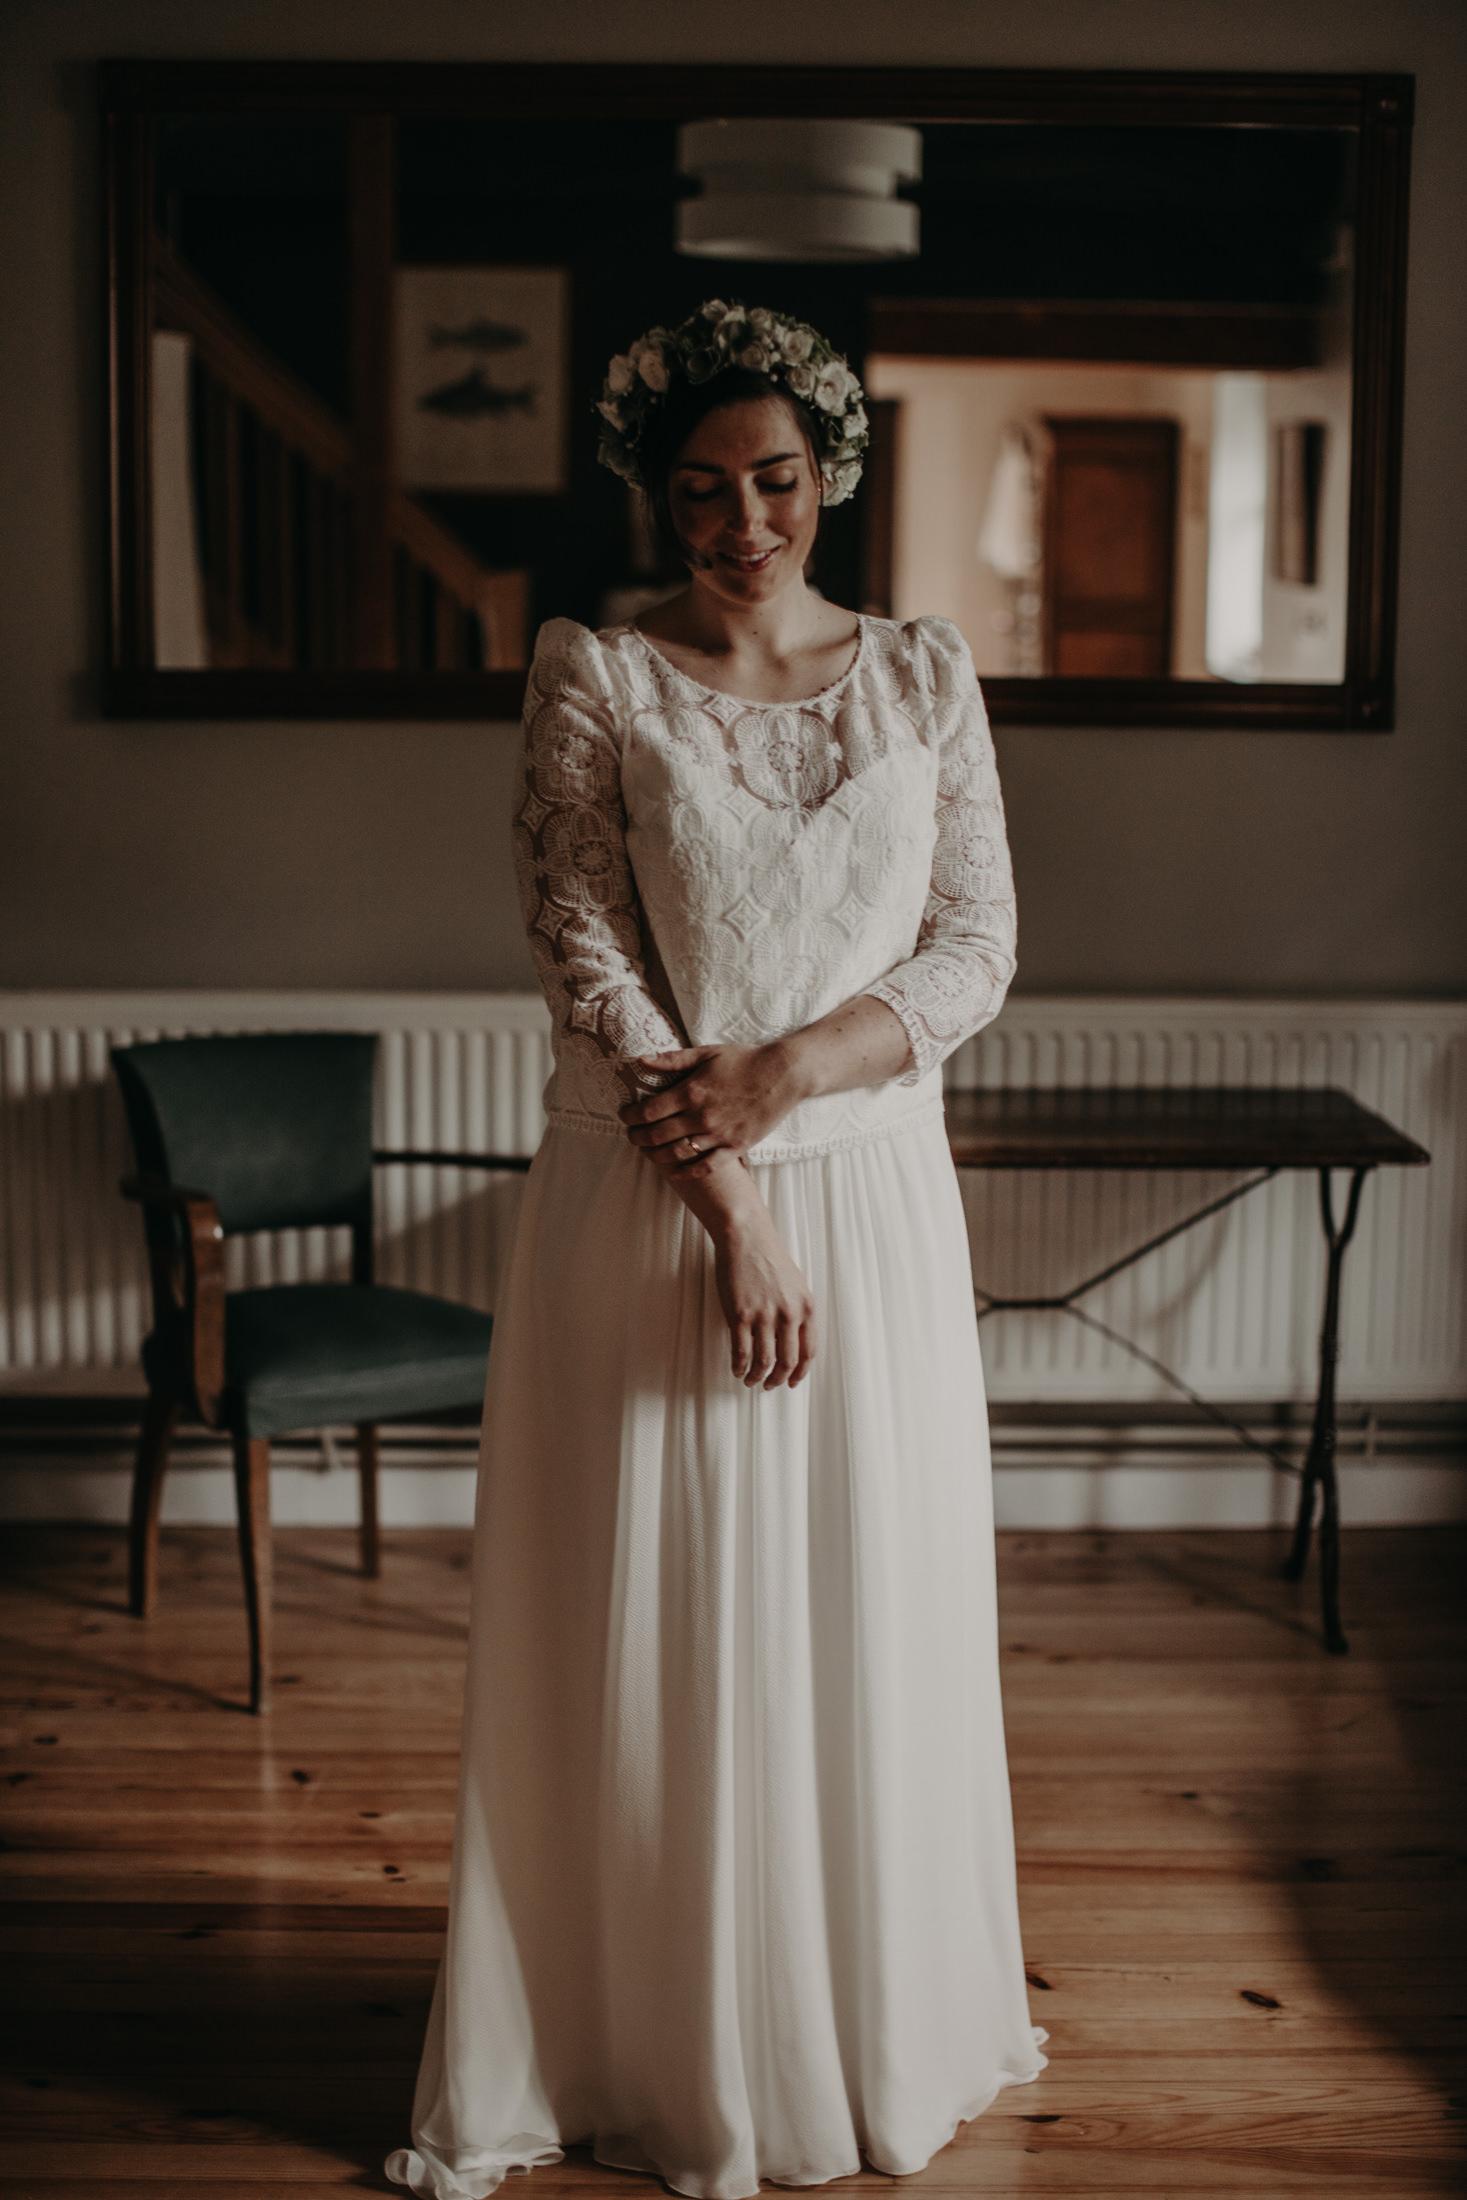 Mariage alsace germany wedding kid-30.jpg